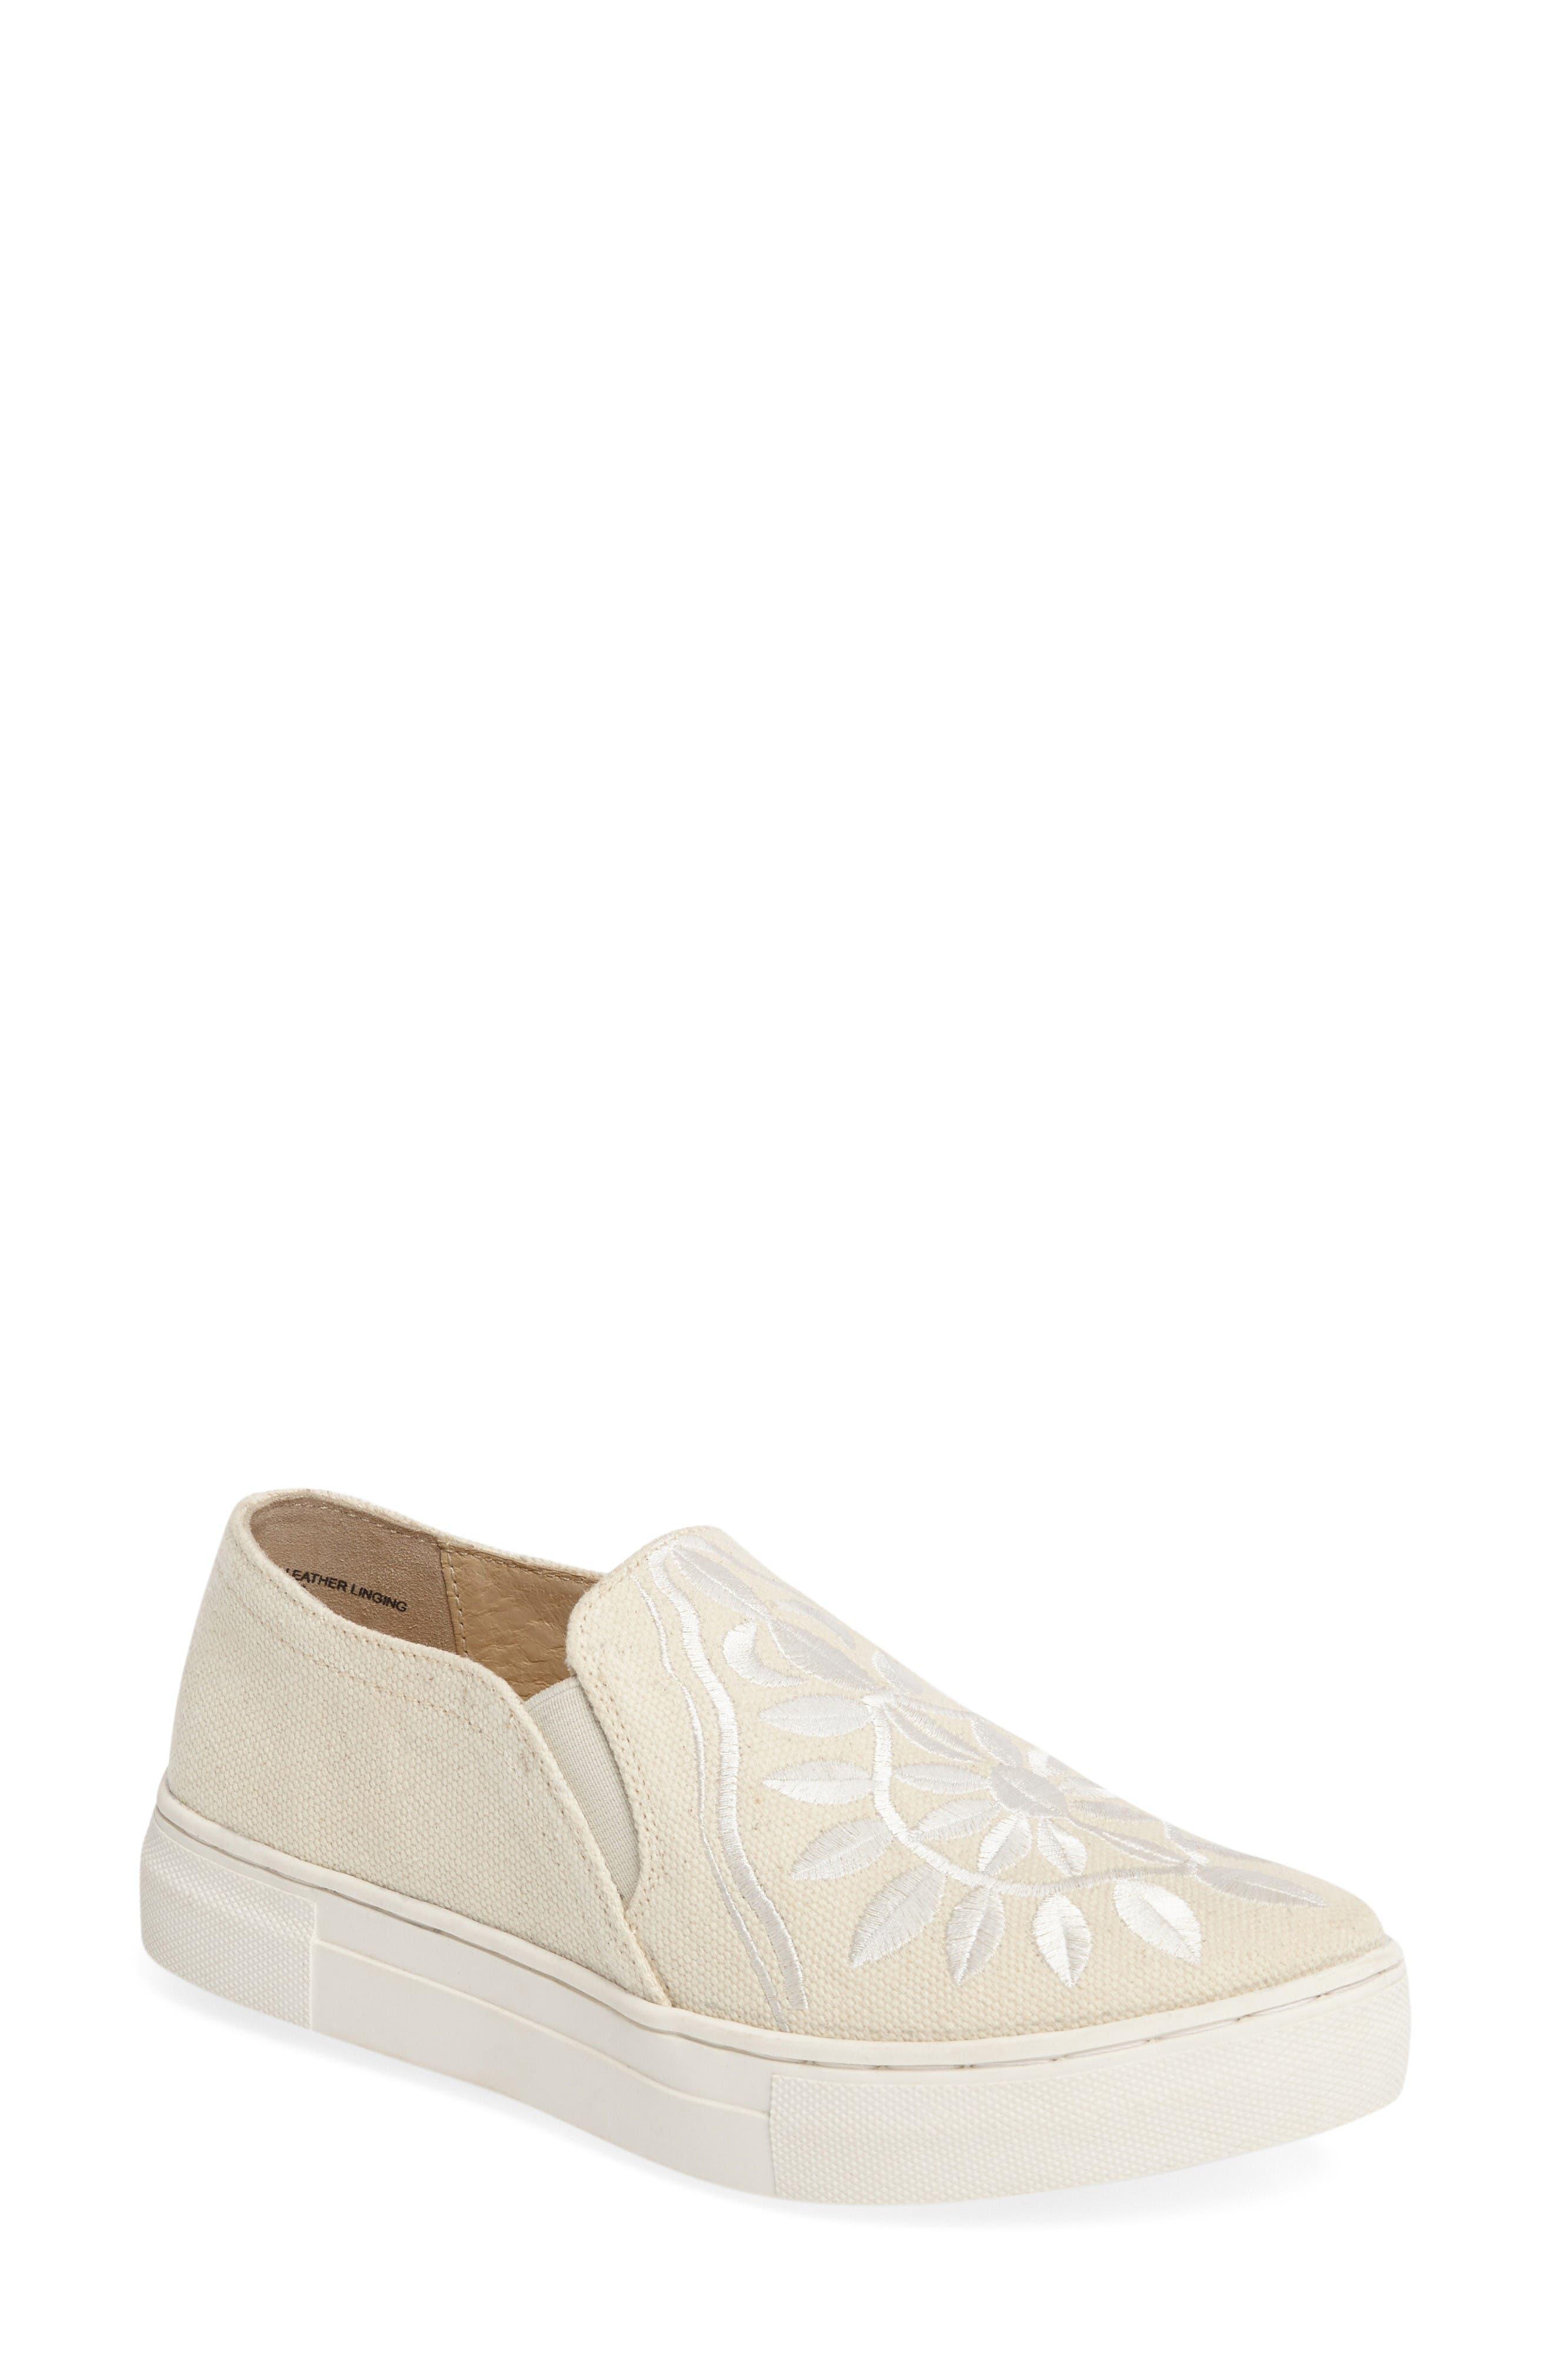 Sunshine Slip-On,                         Main,                         color, Natural/ White Fabric